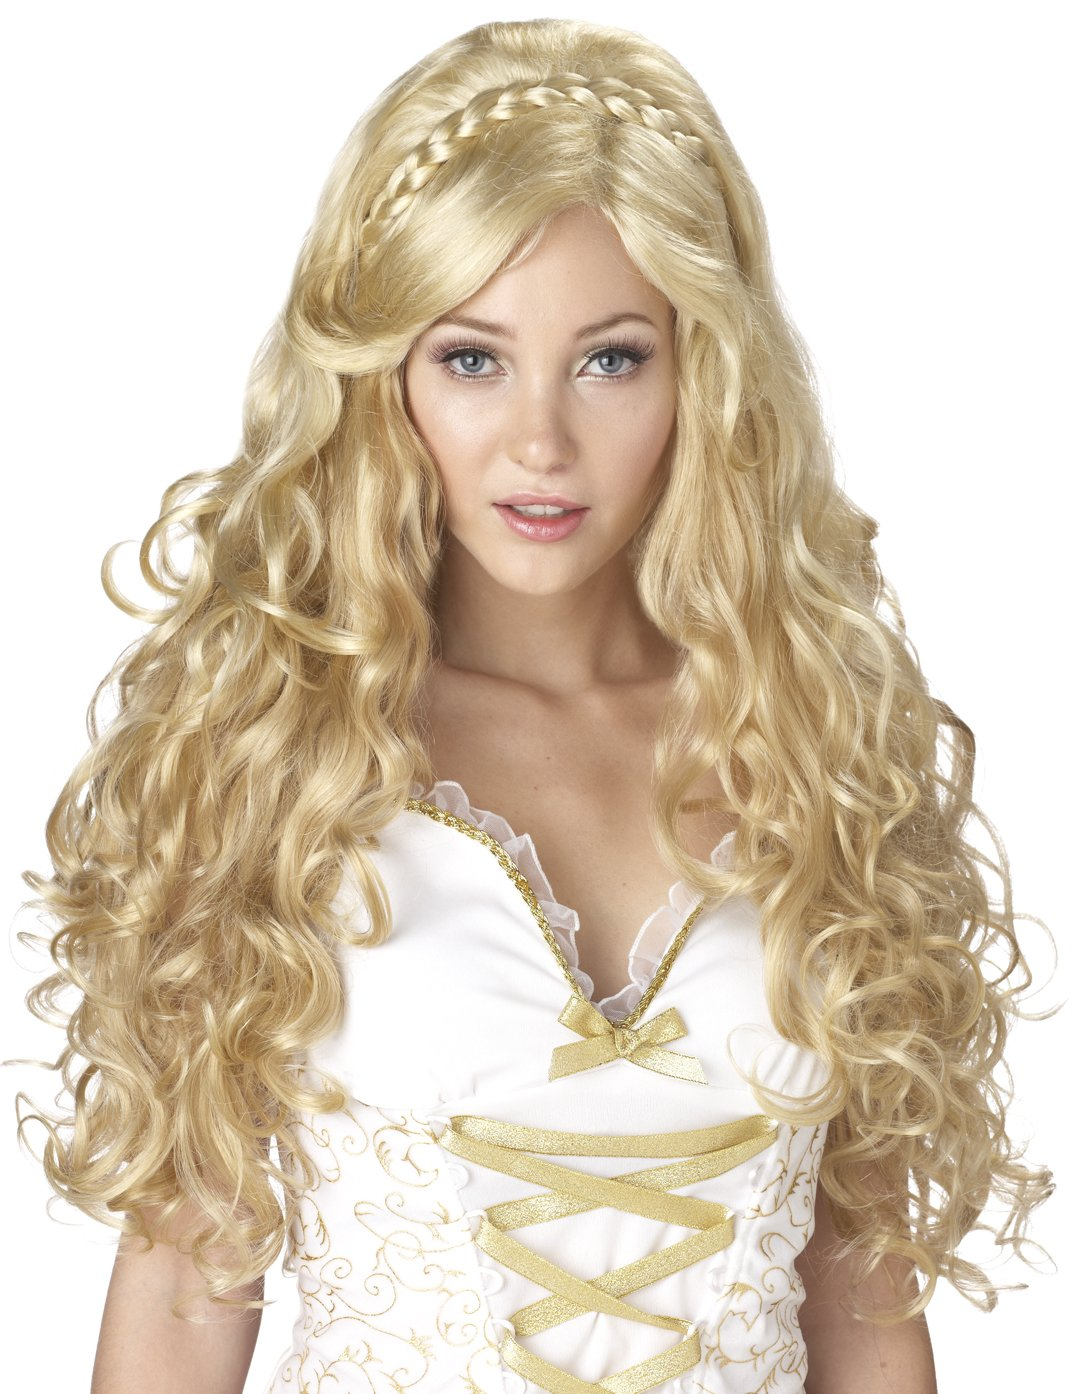 300 Roman Mythical Goddess Greek Adult  Costume Wig #70636